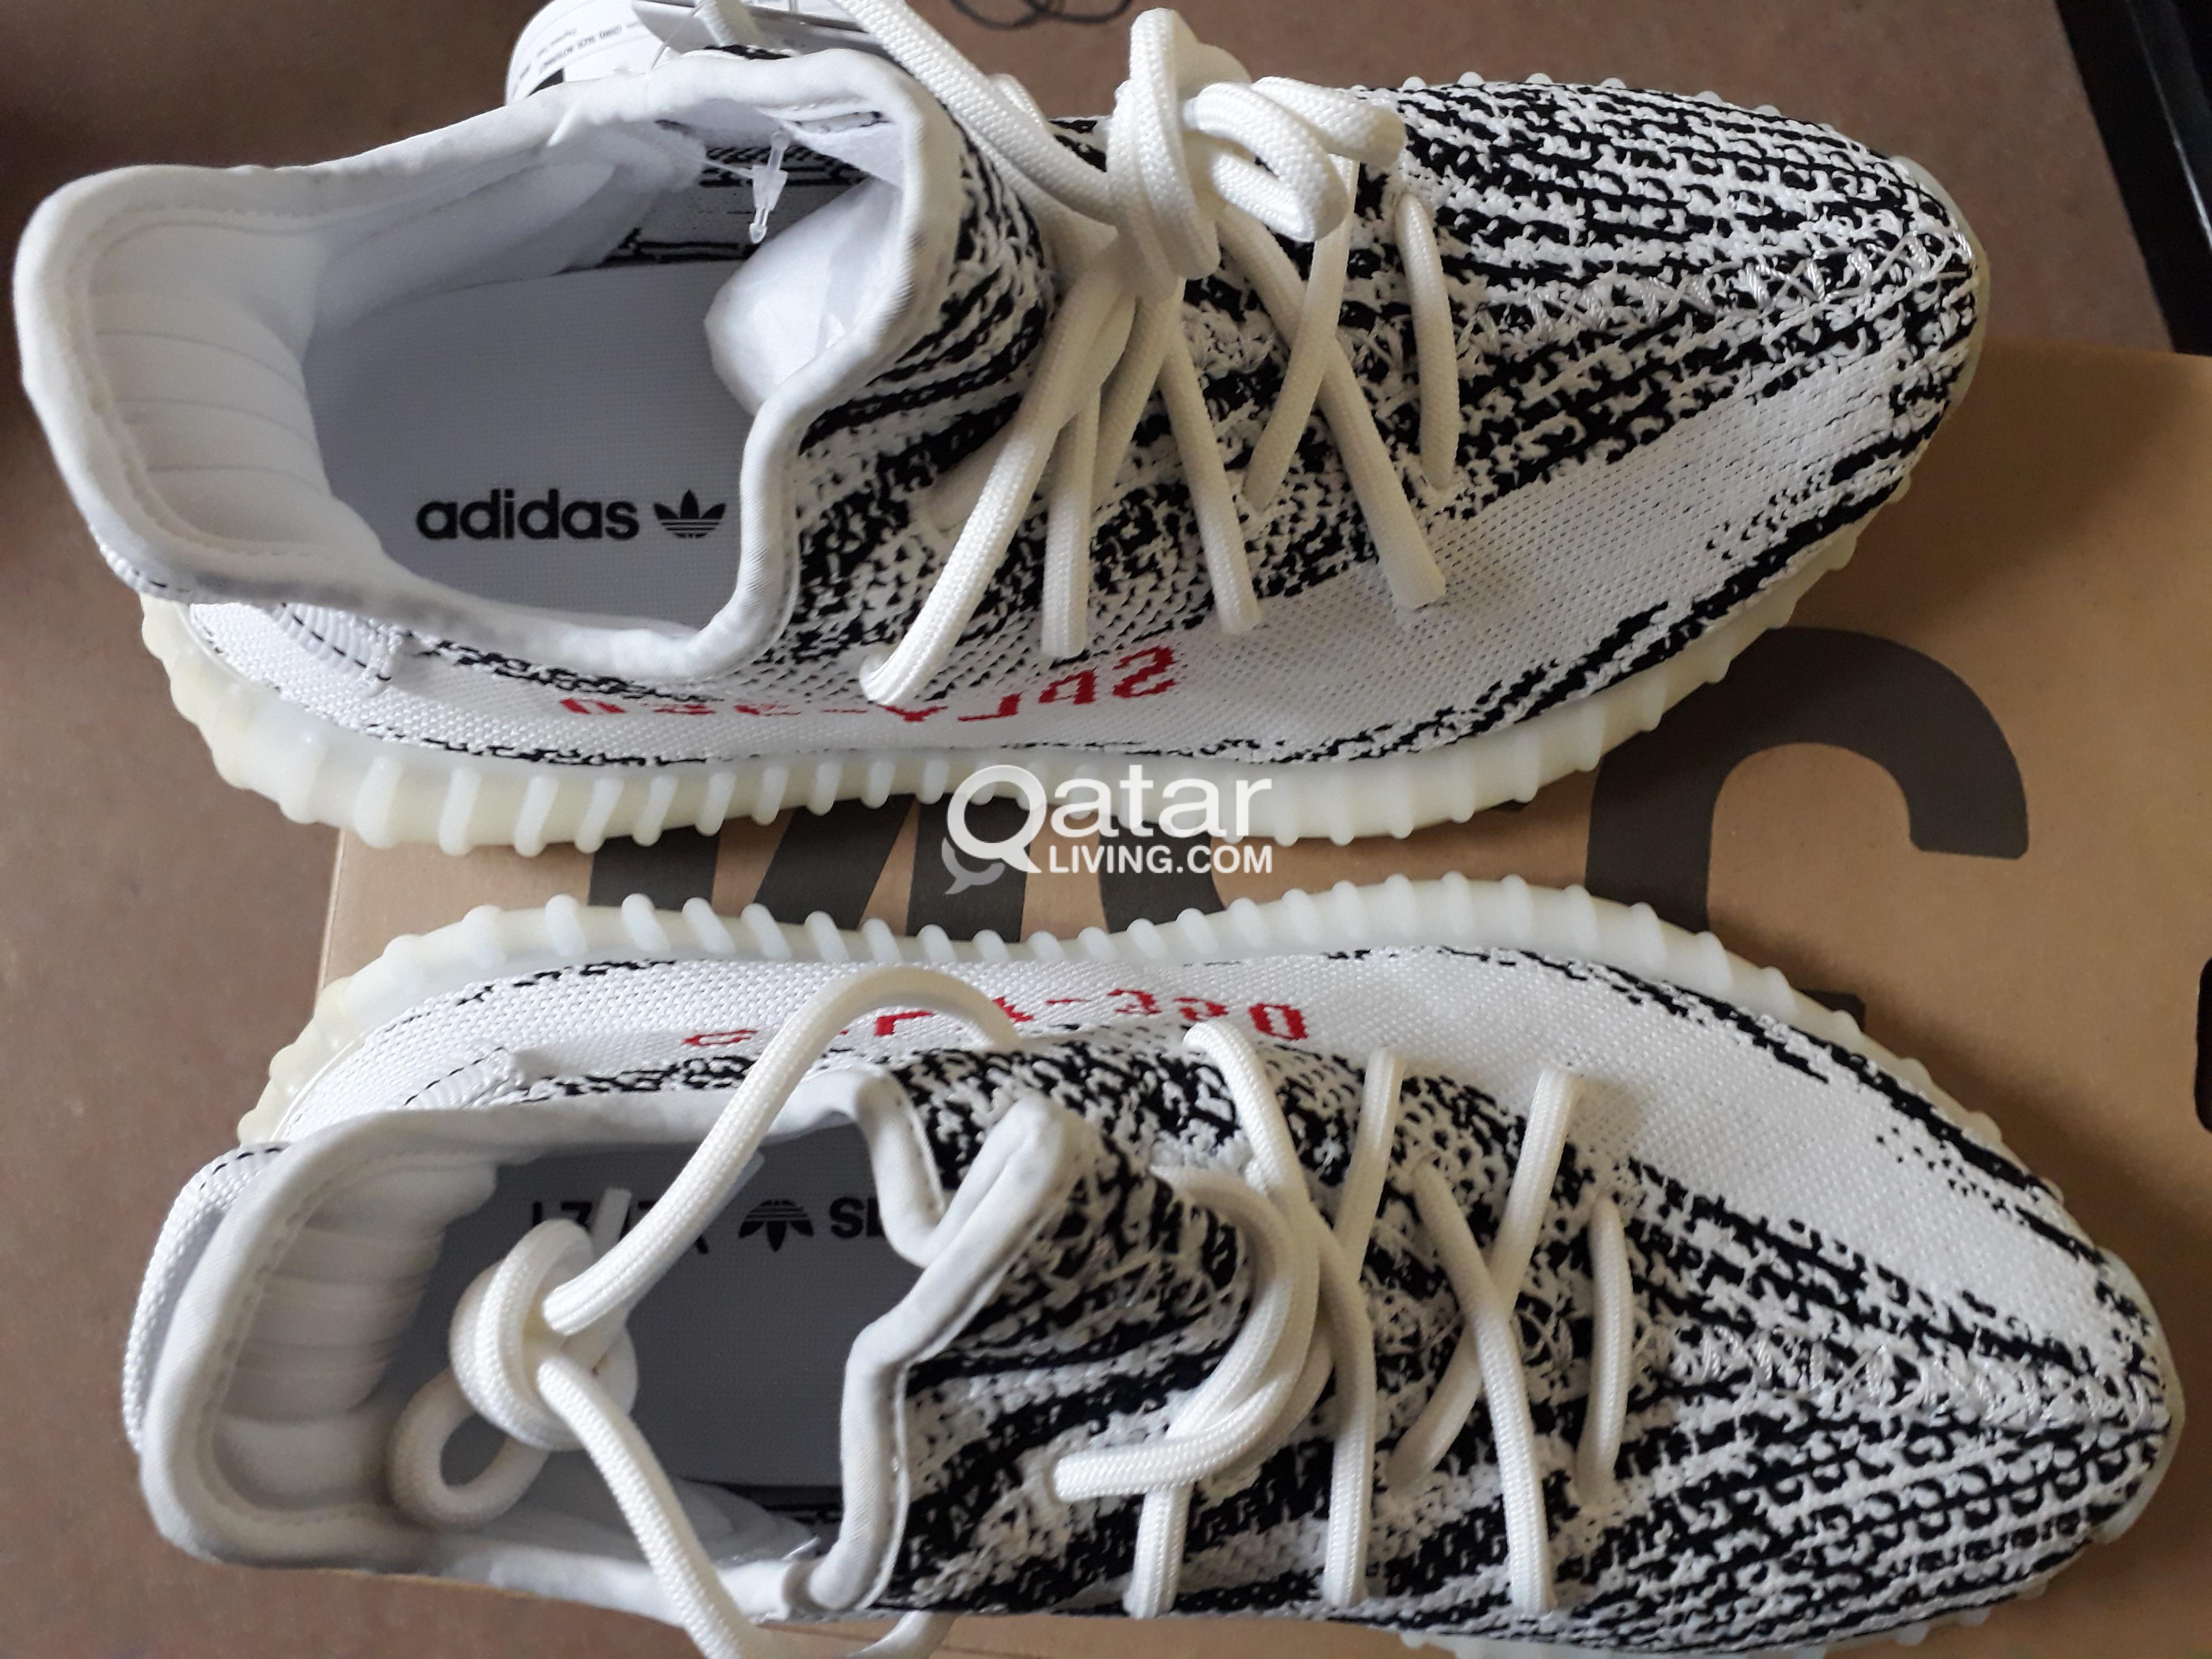 adidas yeezy qatar